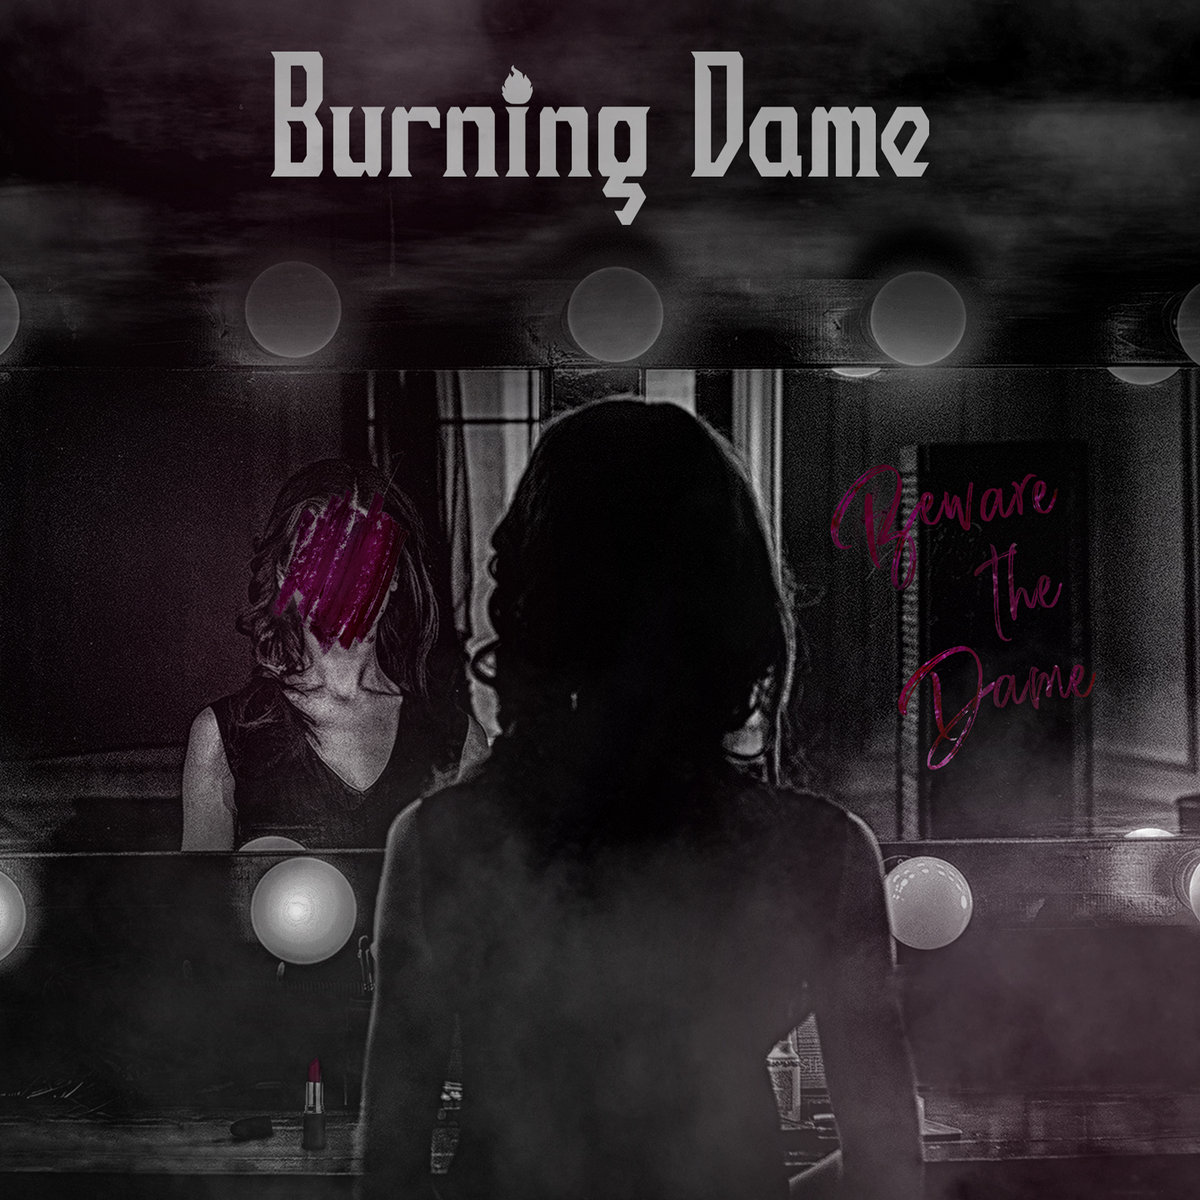 www.facebook.com/burningdame